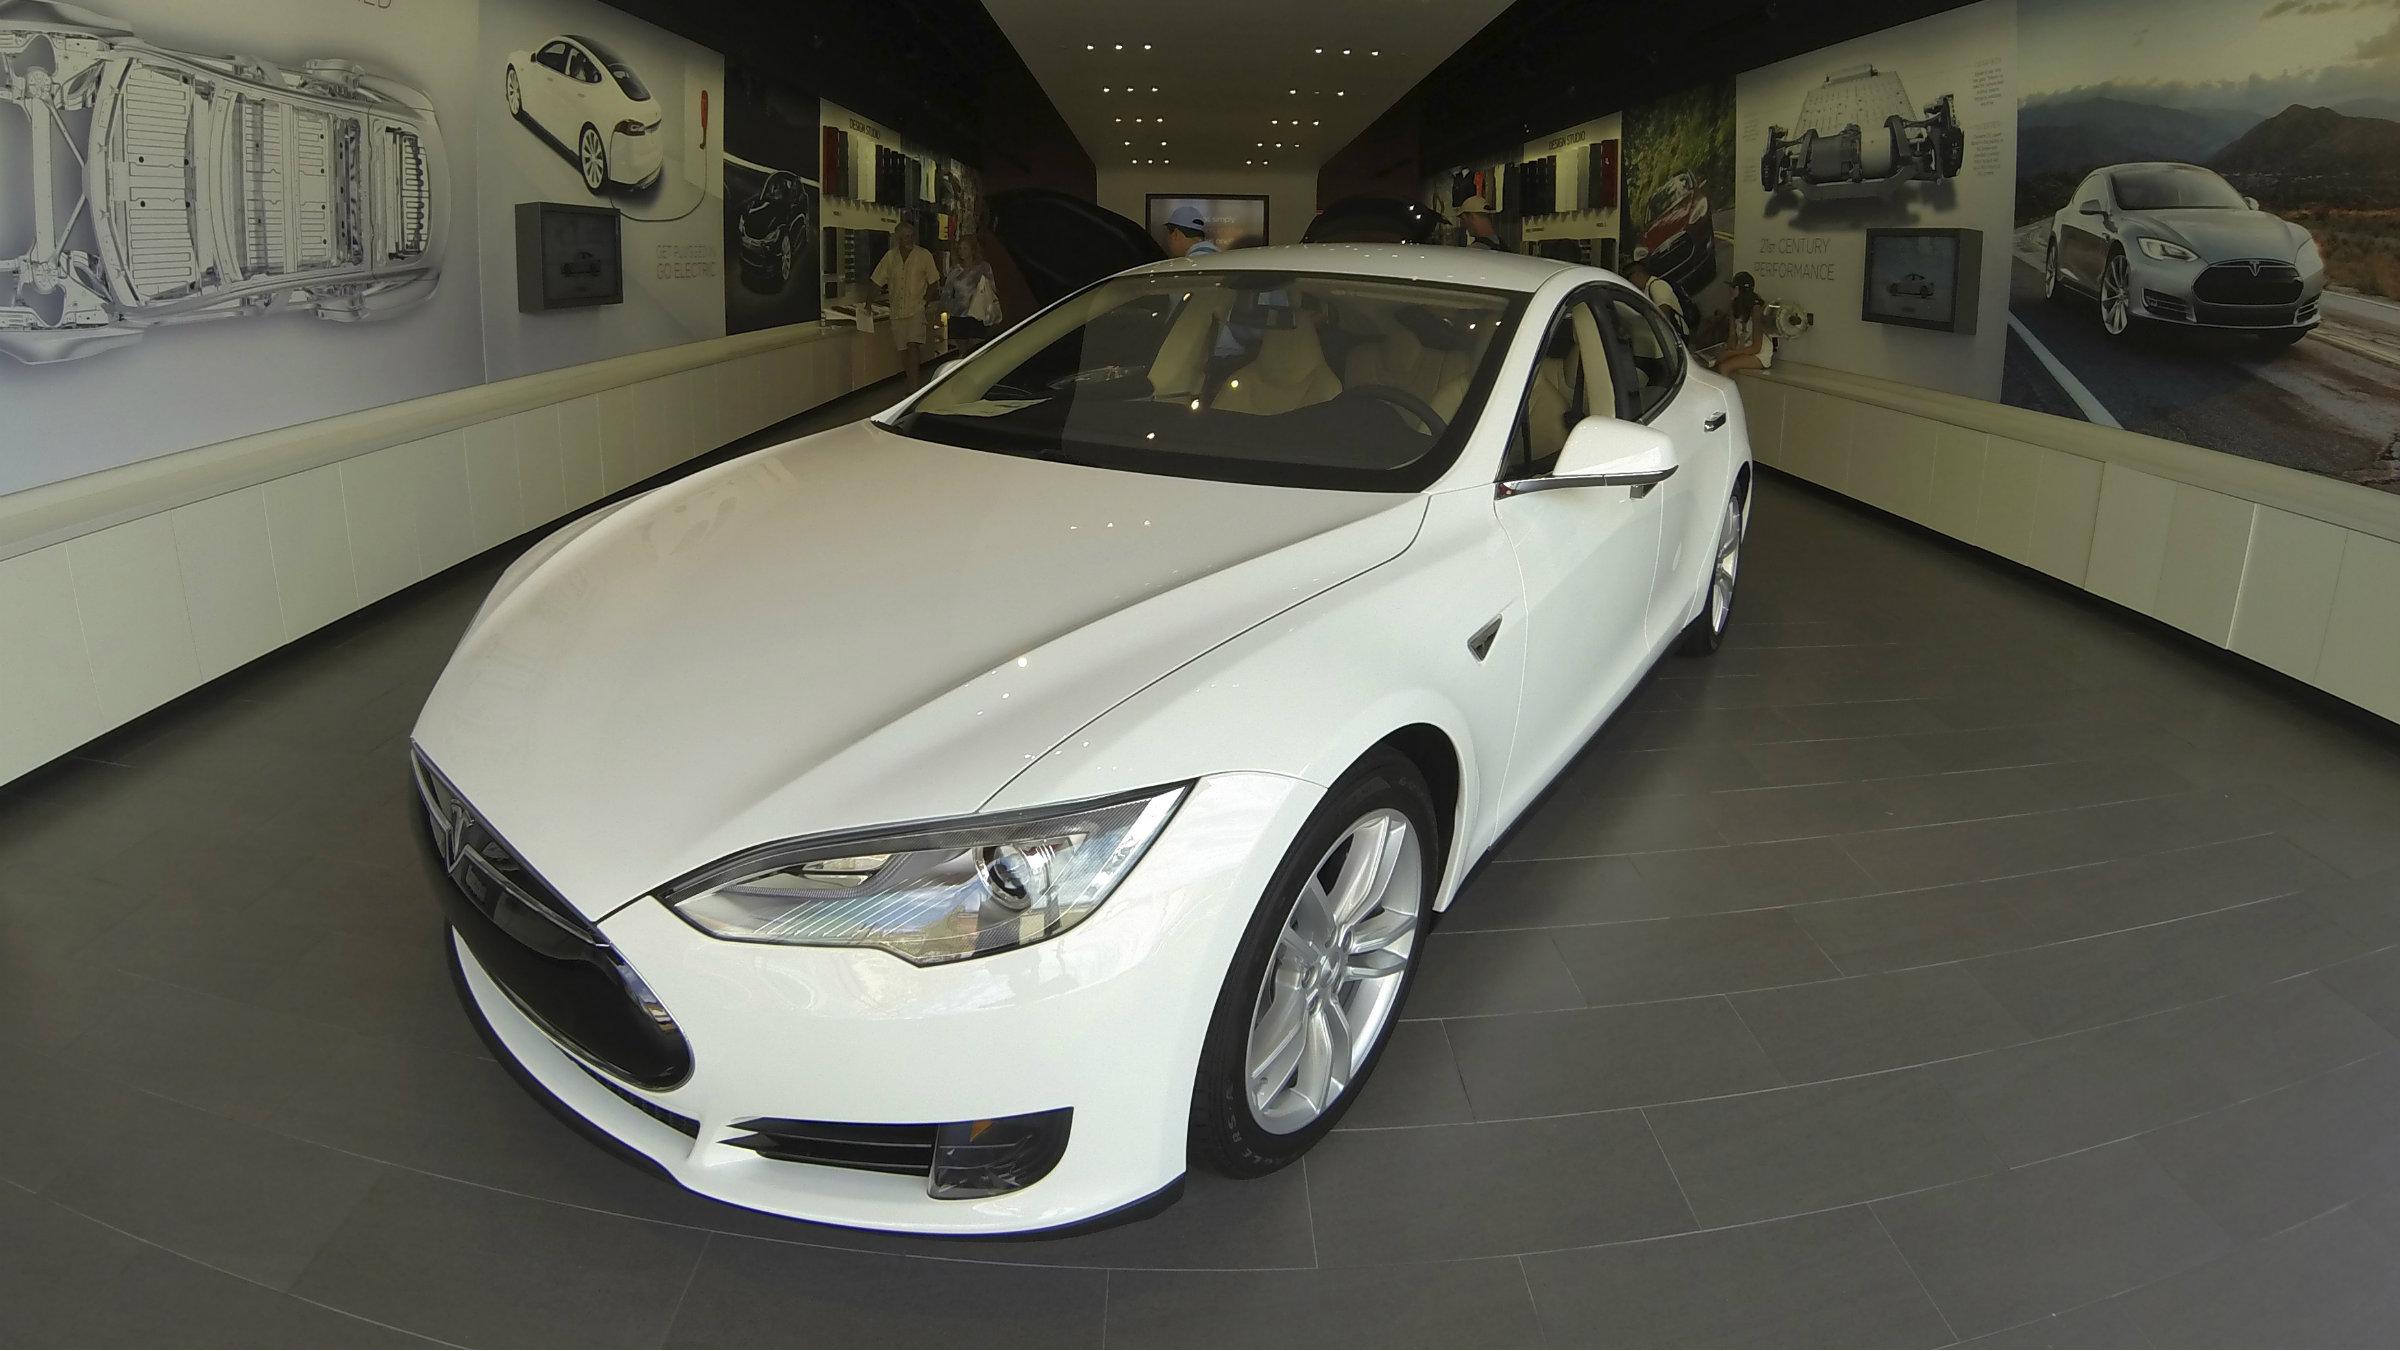 The Tesla S, for sale in La Jolla, Ca., in 2013.